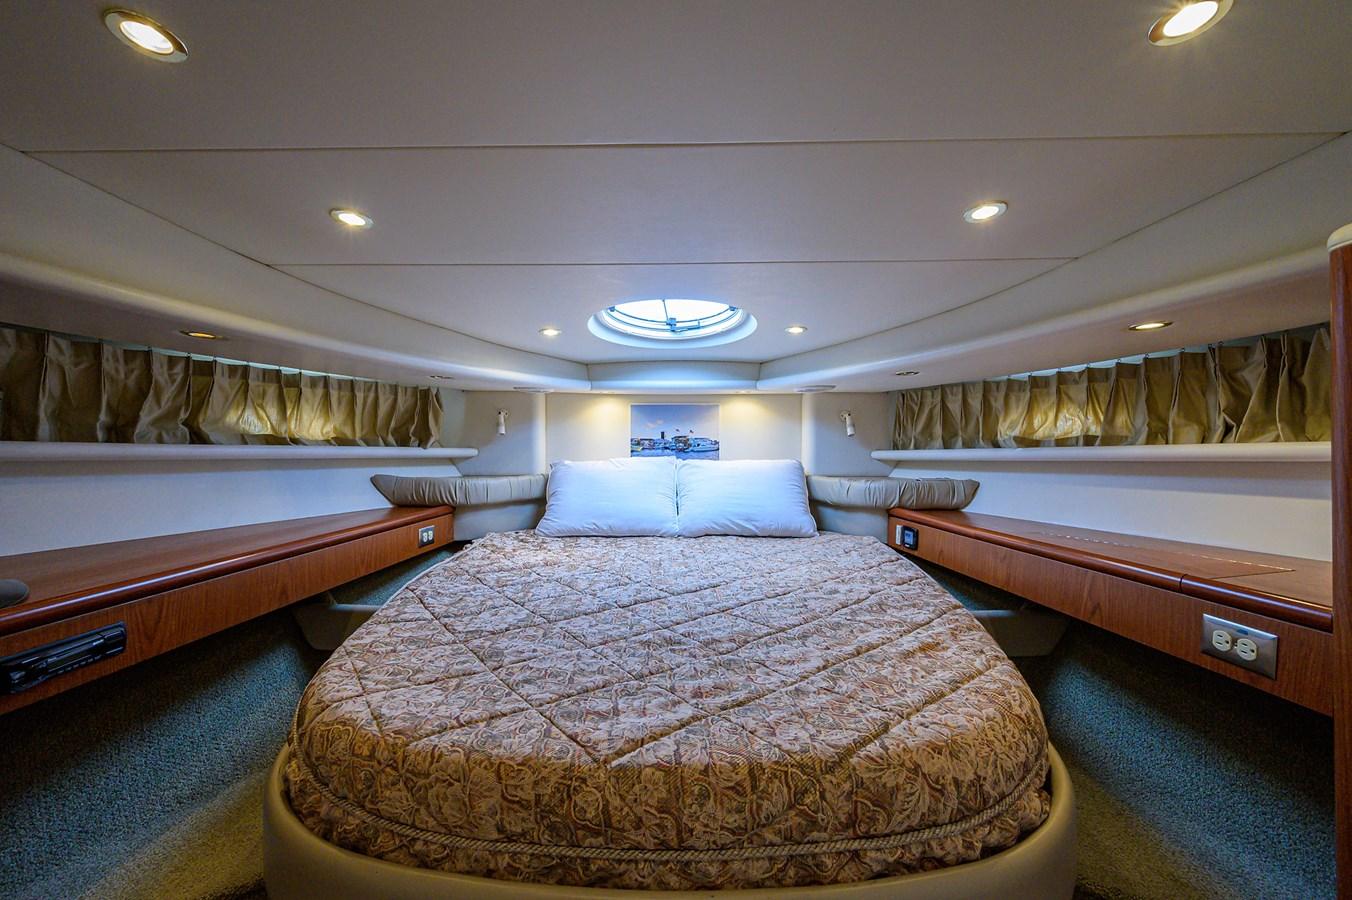 Forward Stateroom 1999 MAXUM 4600 SCB  Cruiser 2884995